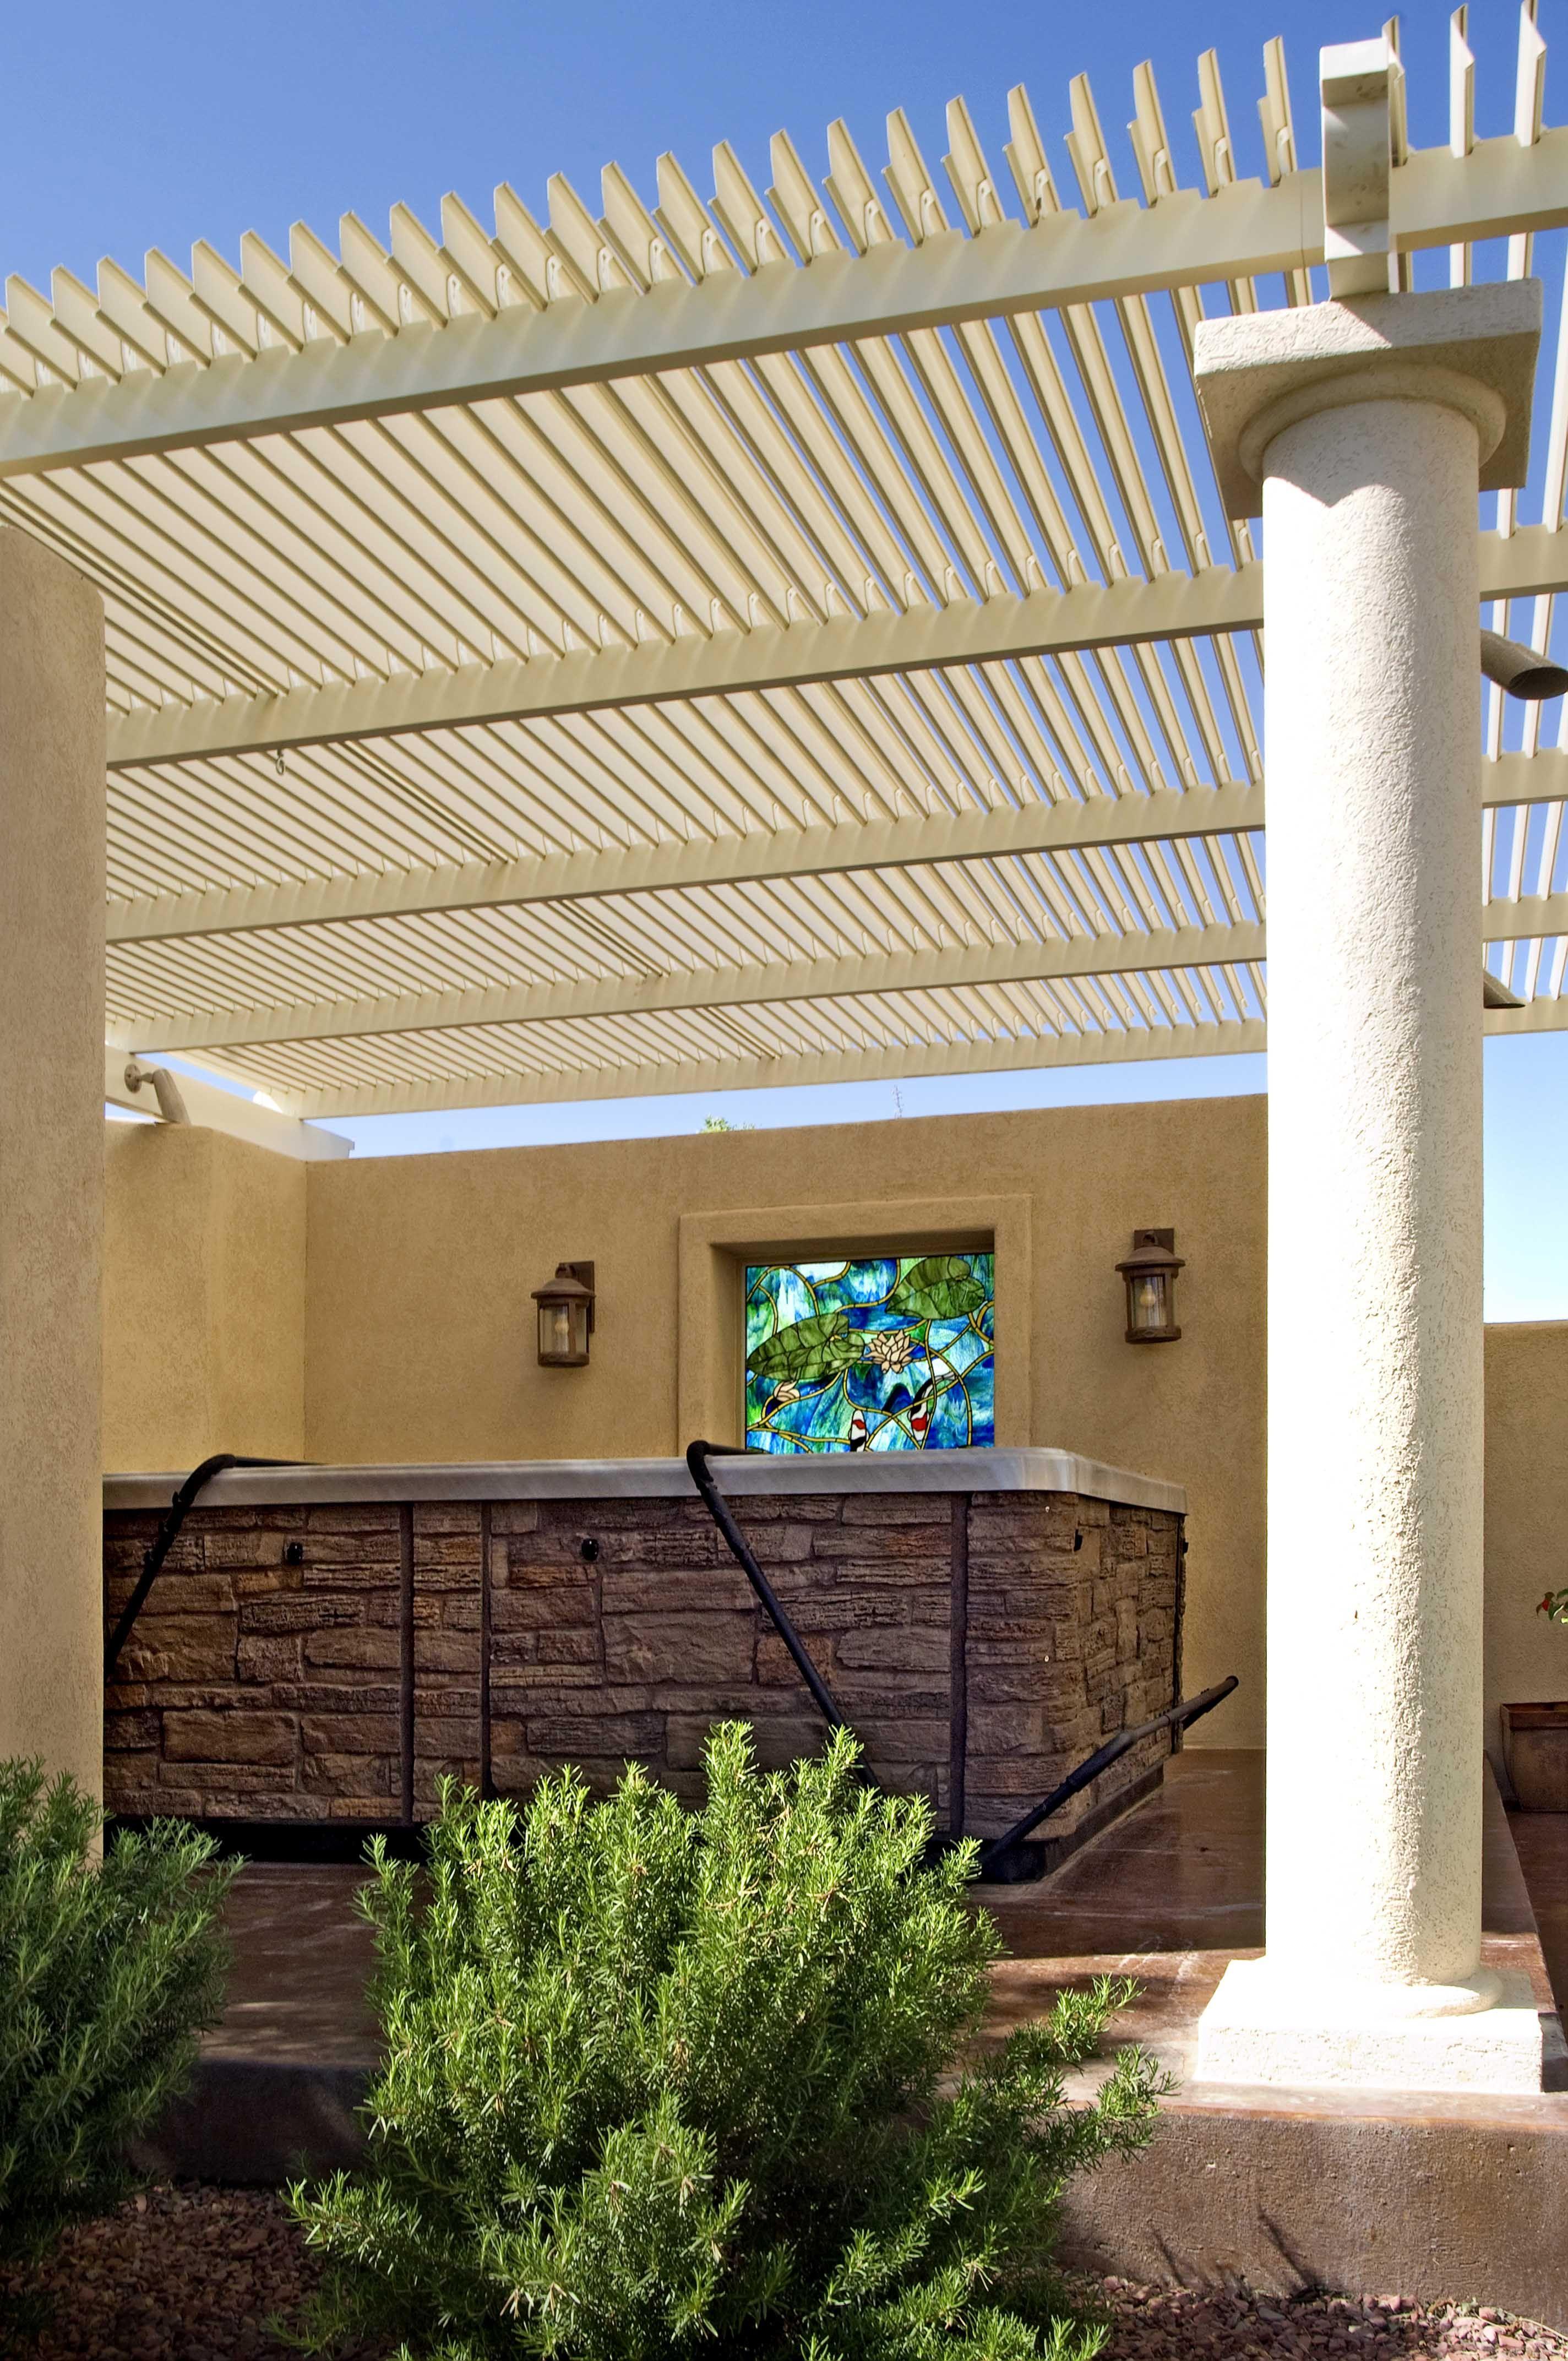 10 solara adjustable patio covers ideas